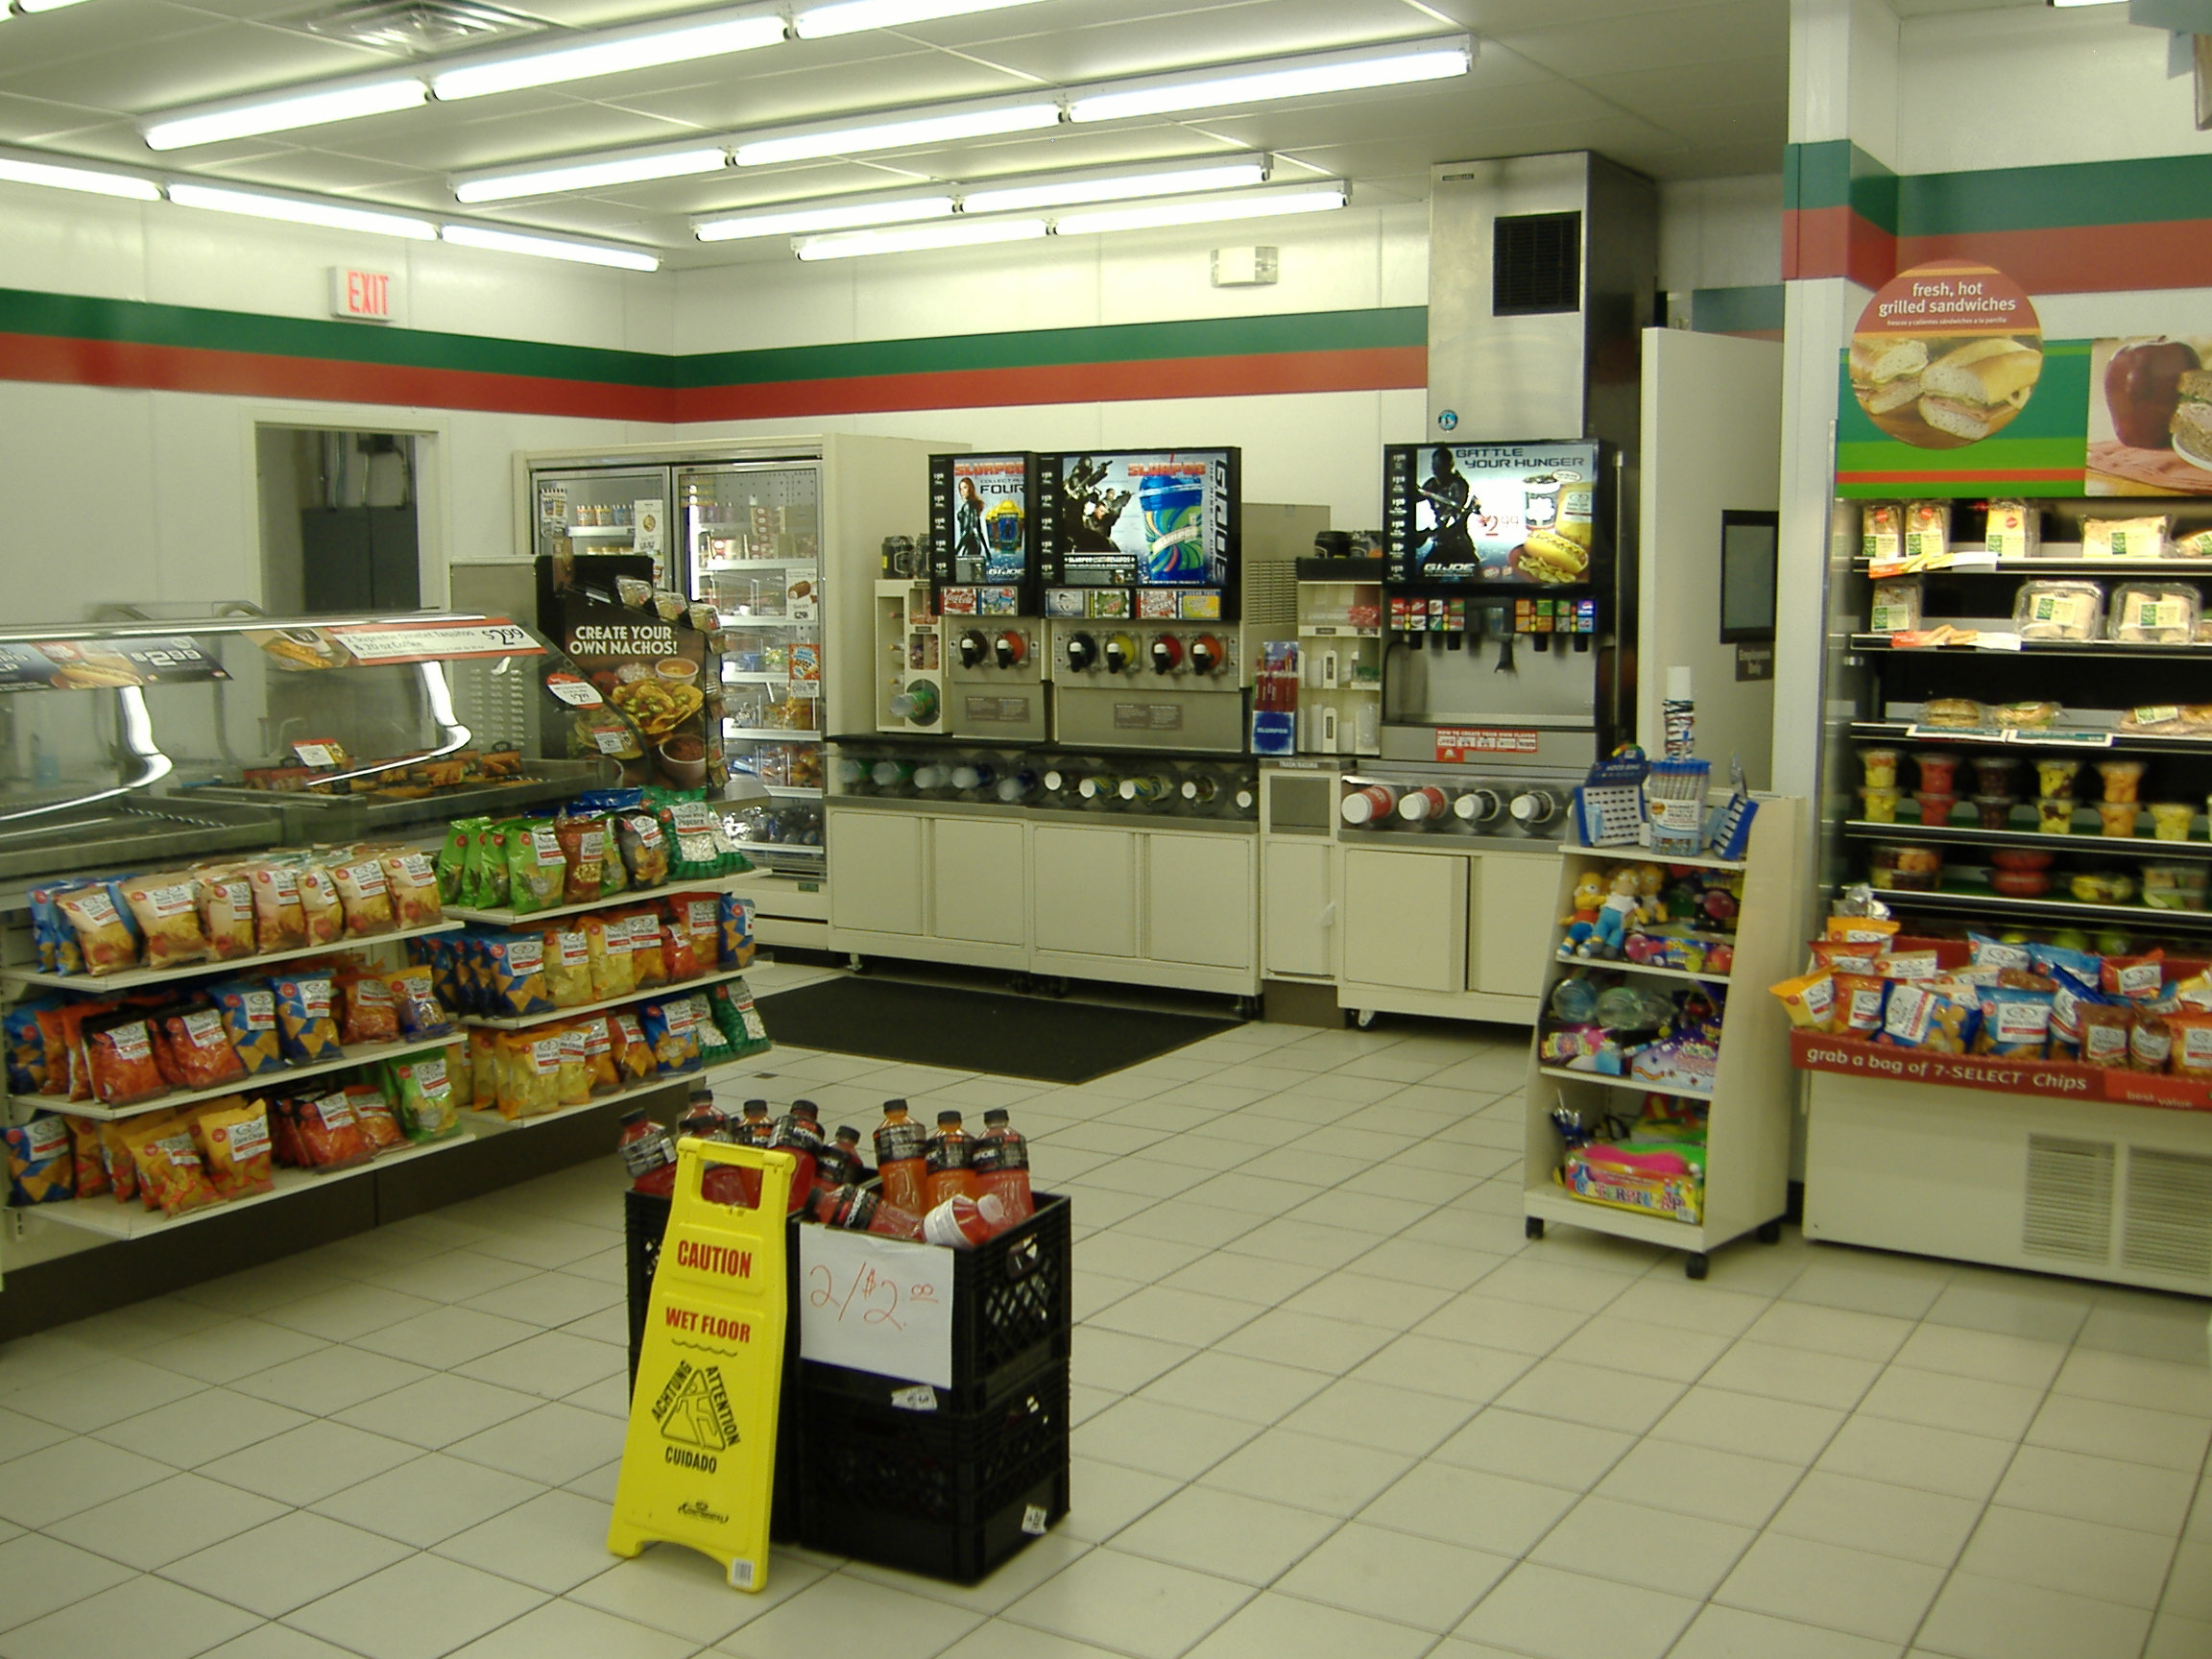 7-11 Bobcat Convenience - Gas Station 6